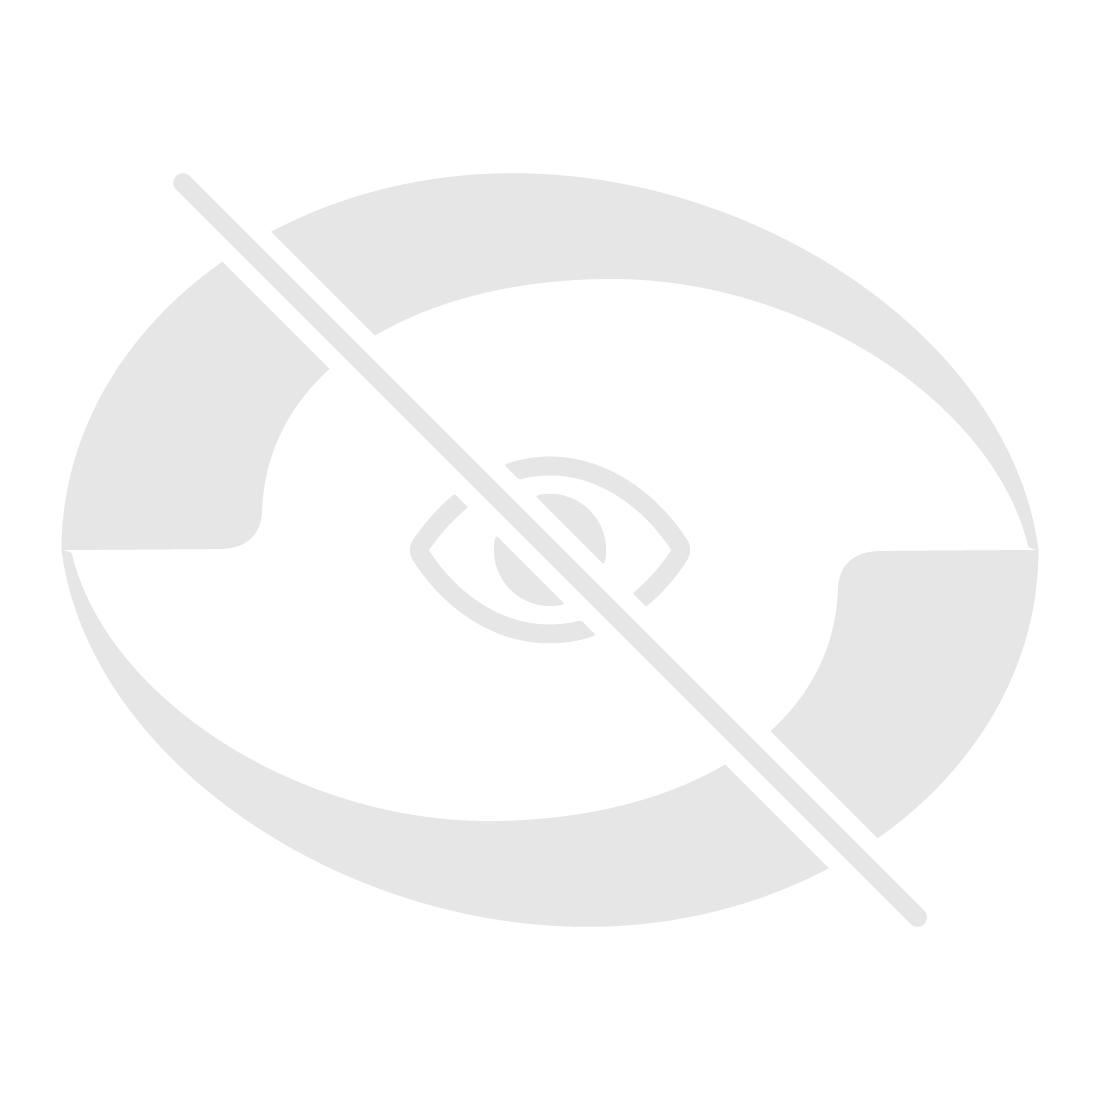 GeoVision GV-1120B-16 • 16 channel hybrid video capture card